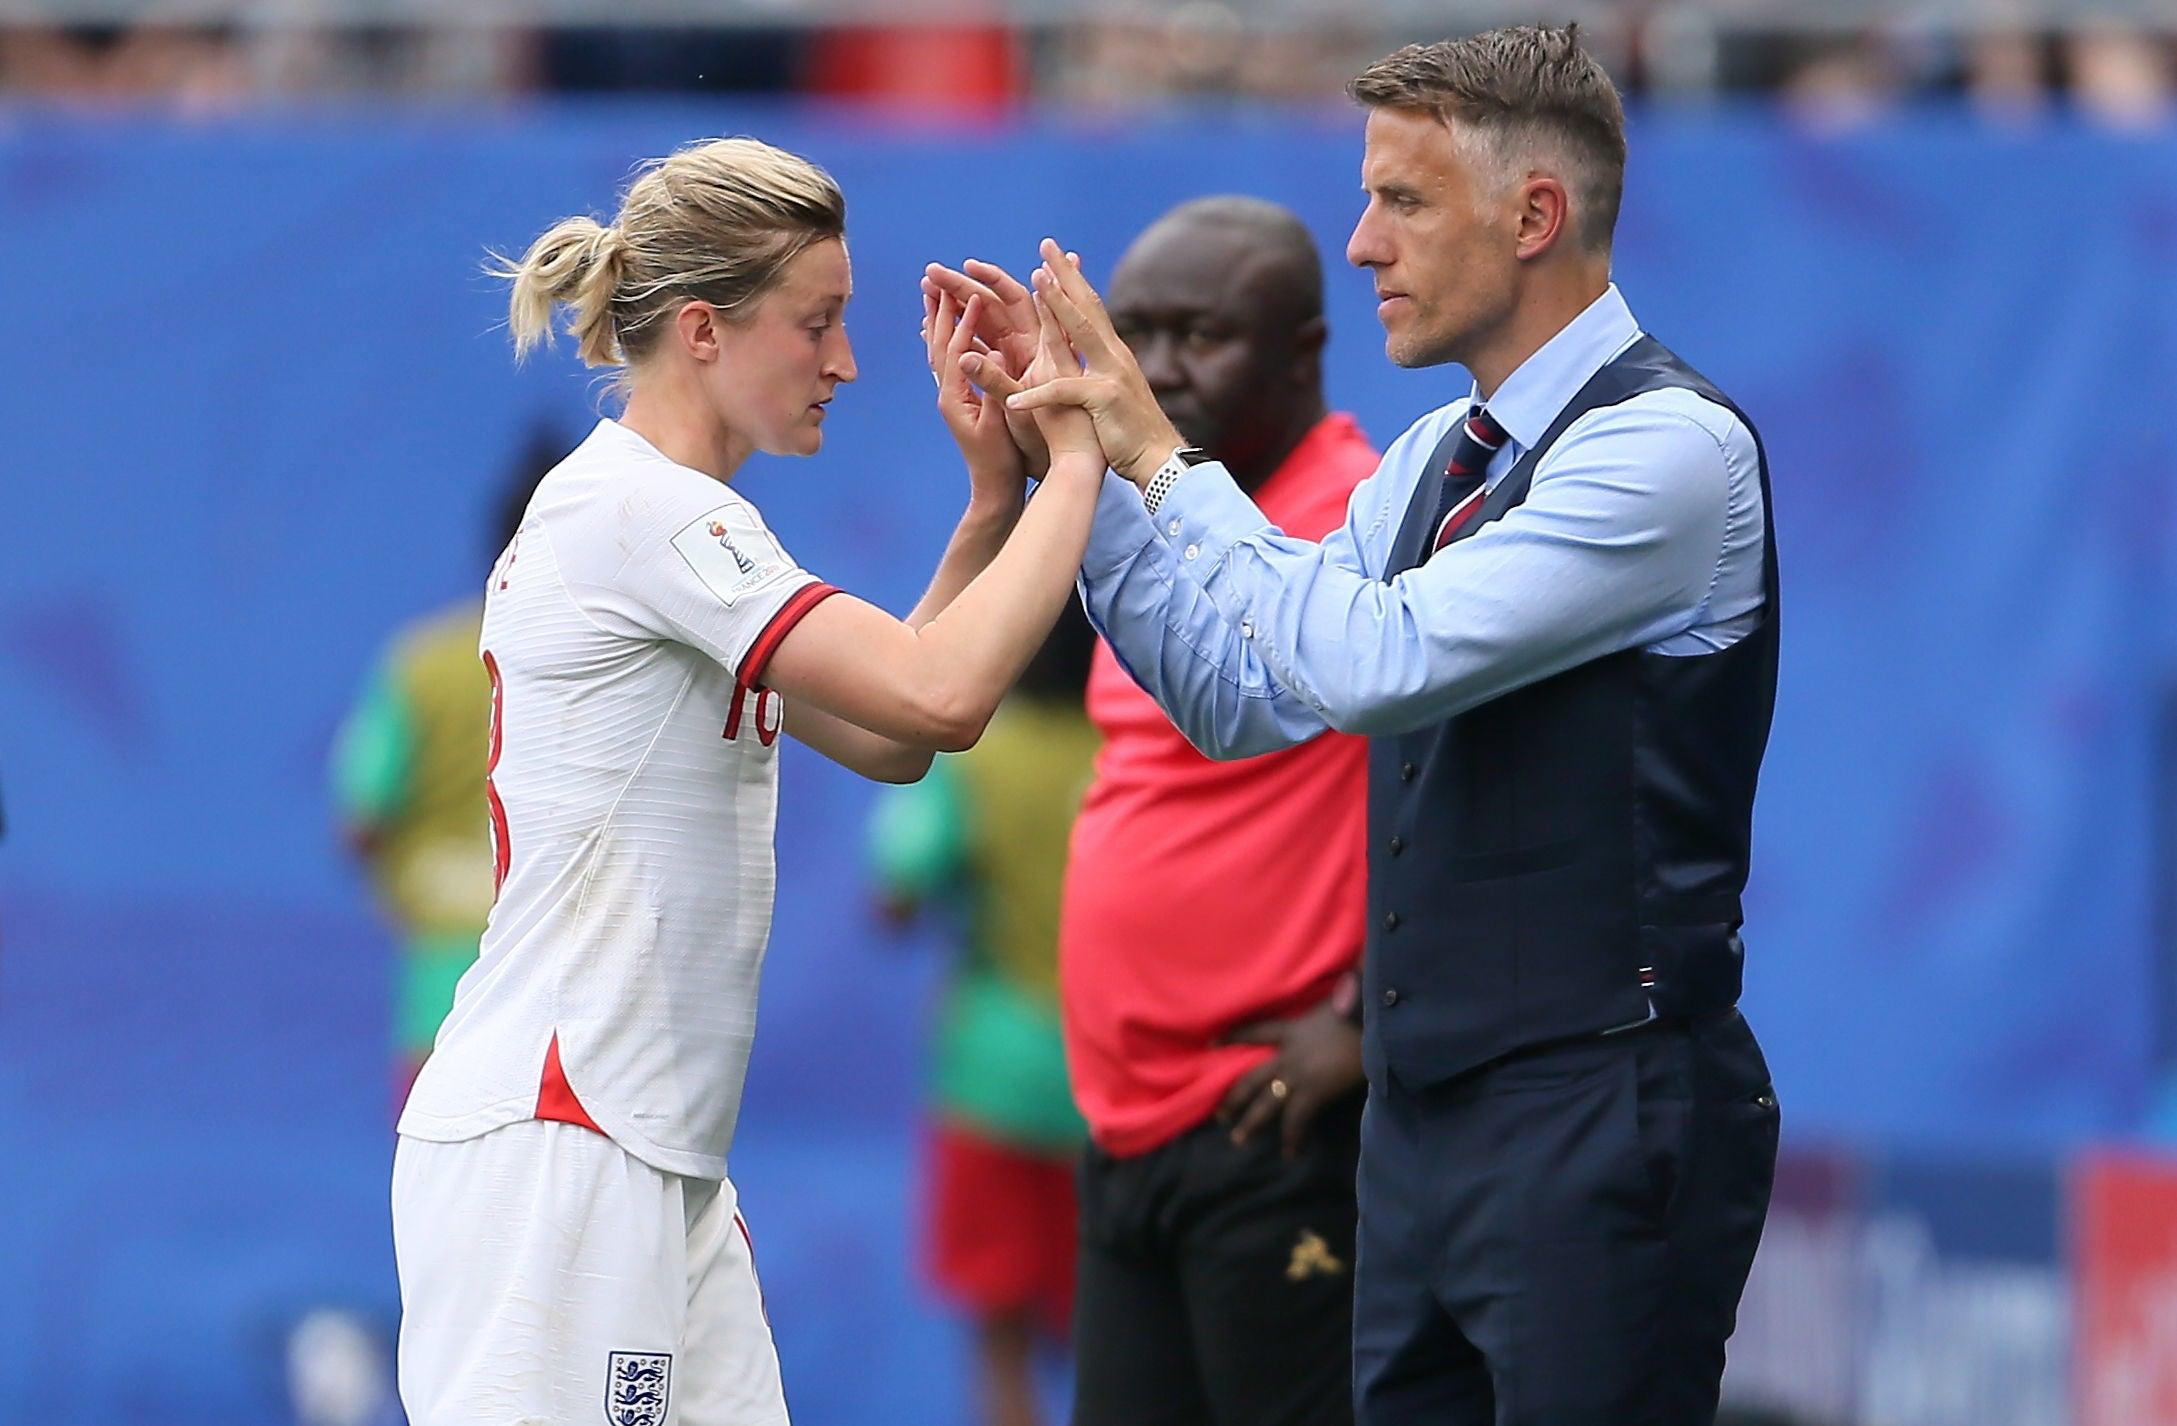 Women's World Cup 2019: USA's Ali Krieger backs Megan